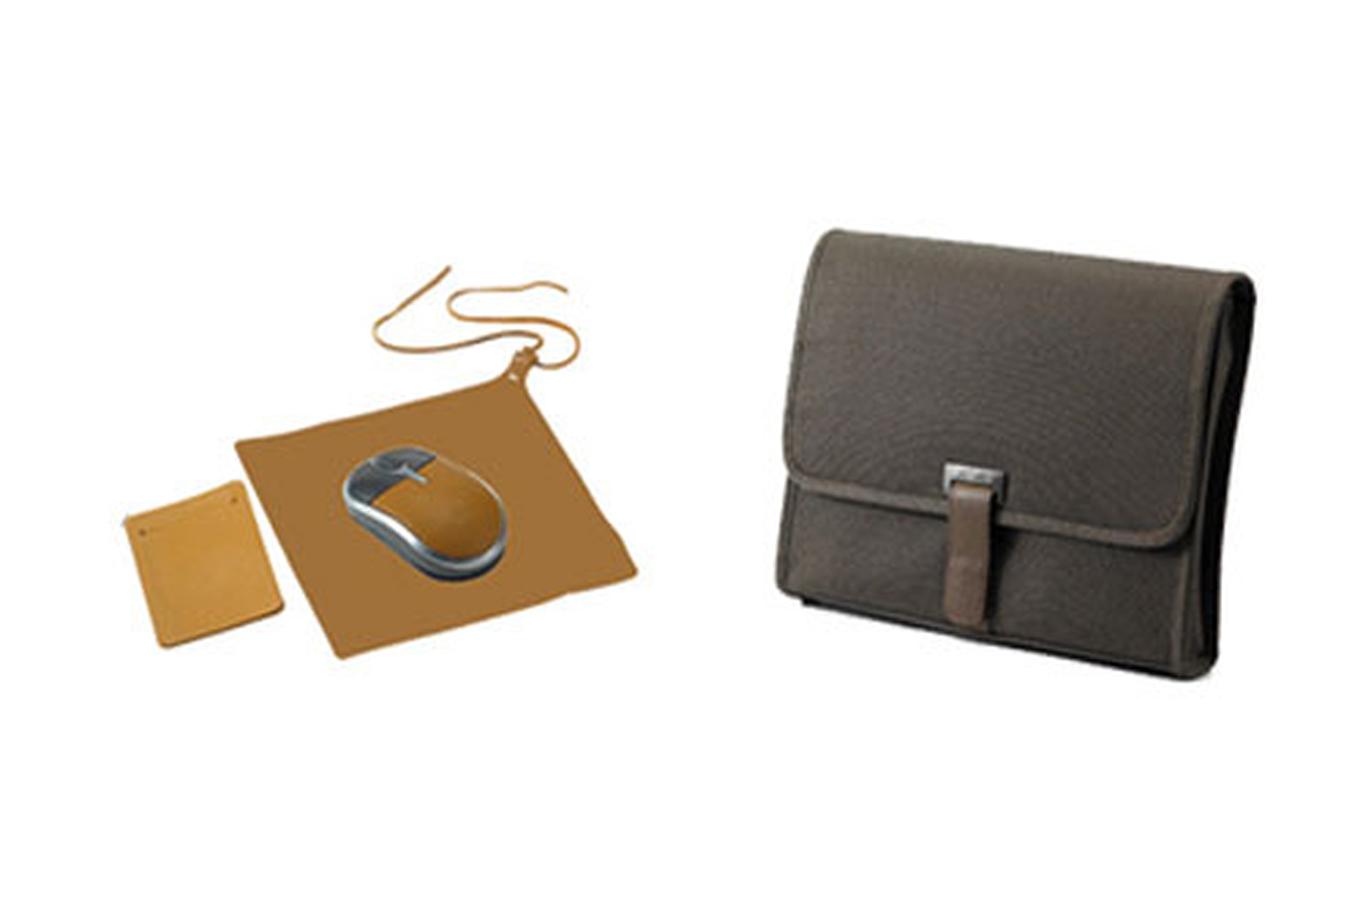 pc portable asus s6f 4008r cuir 11 1 pouces s6f. Black Bedroom Furniture Sets. Home Design Ideas